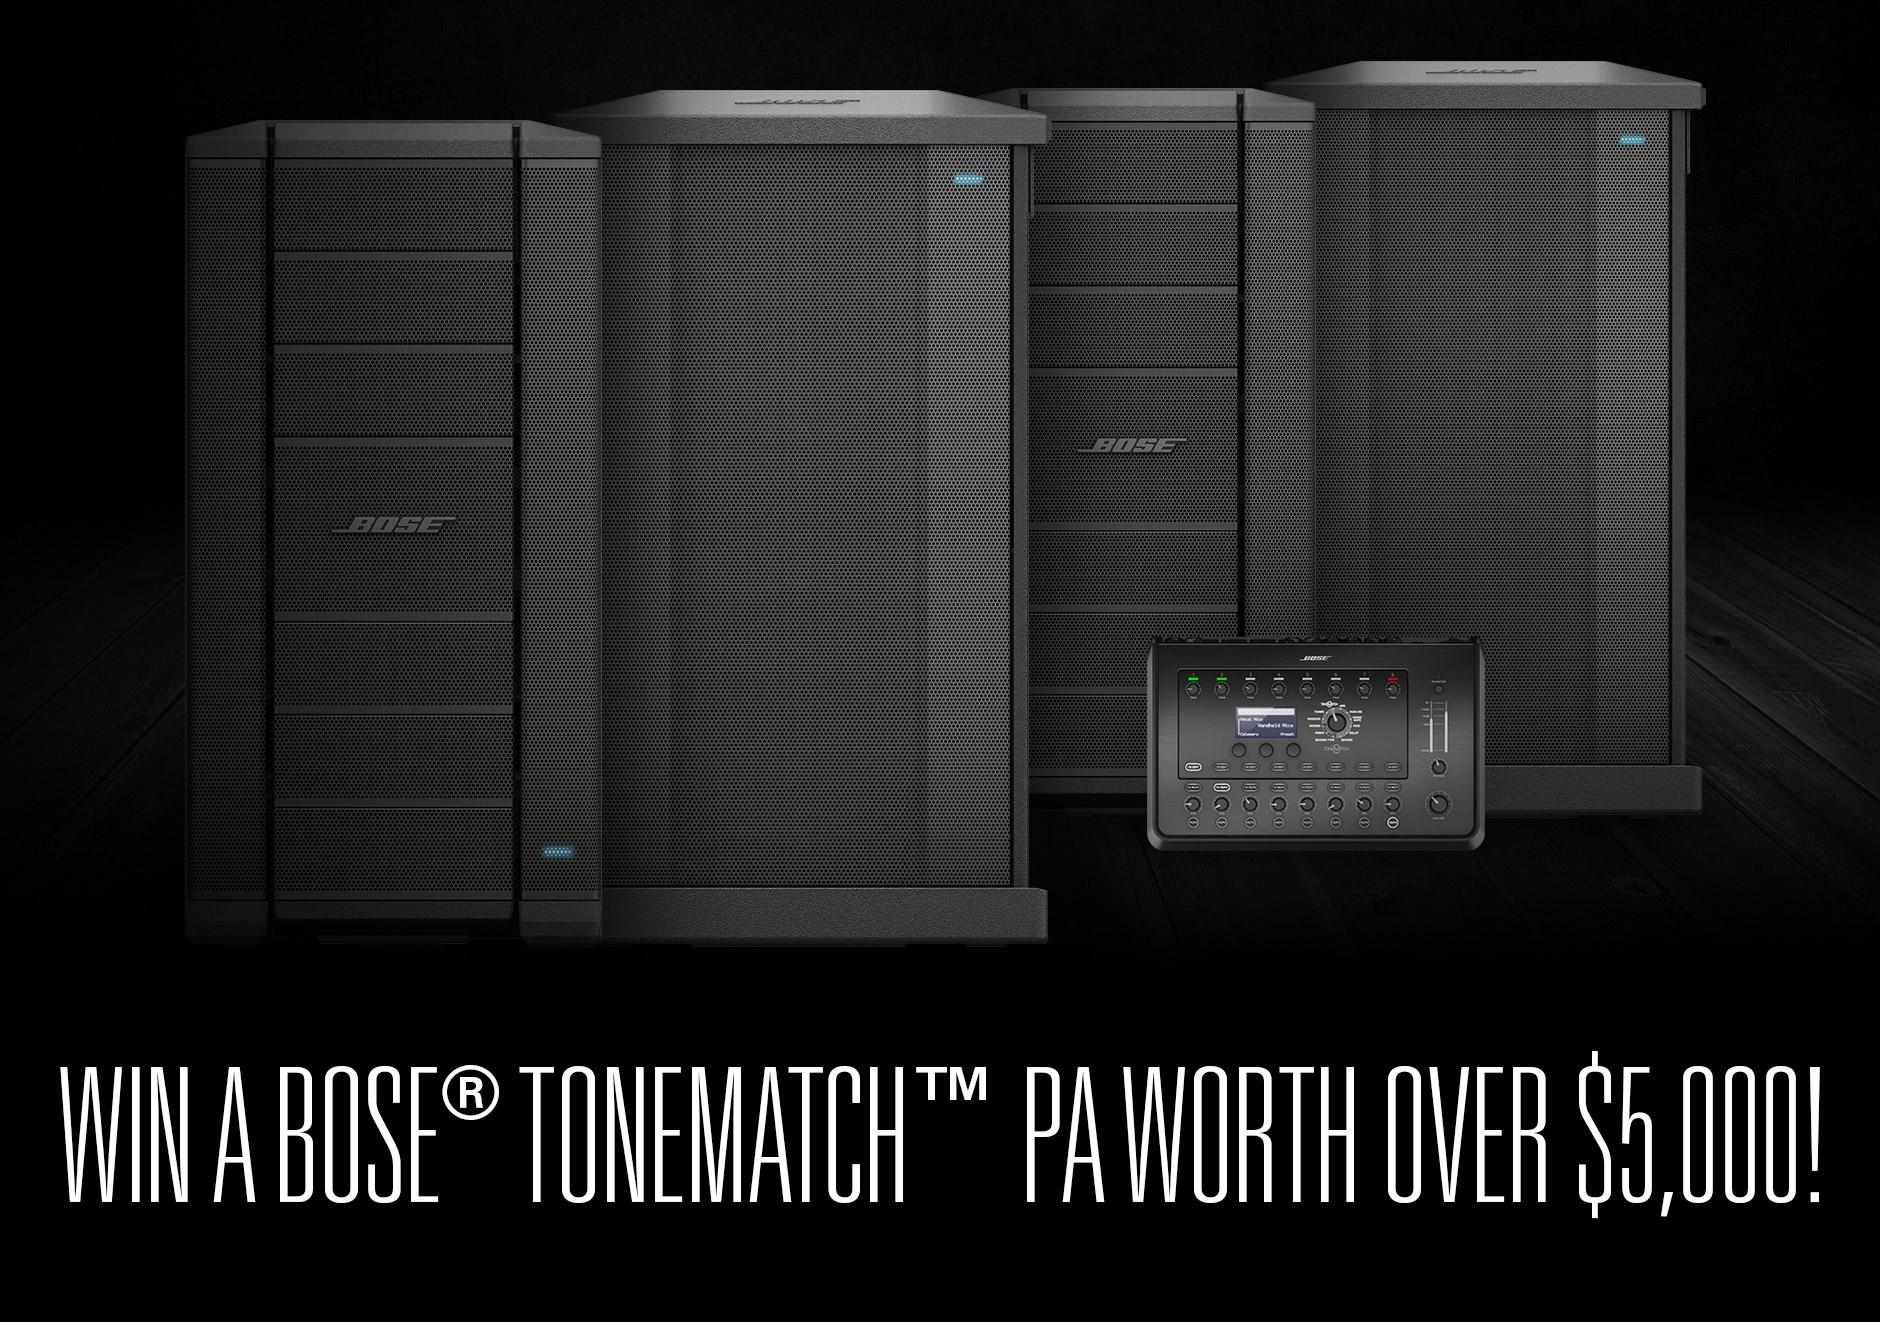 Bose ToneMatch PA System Giveaway